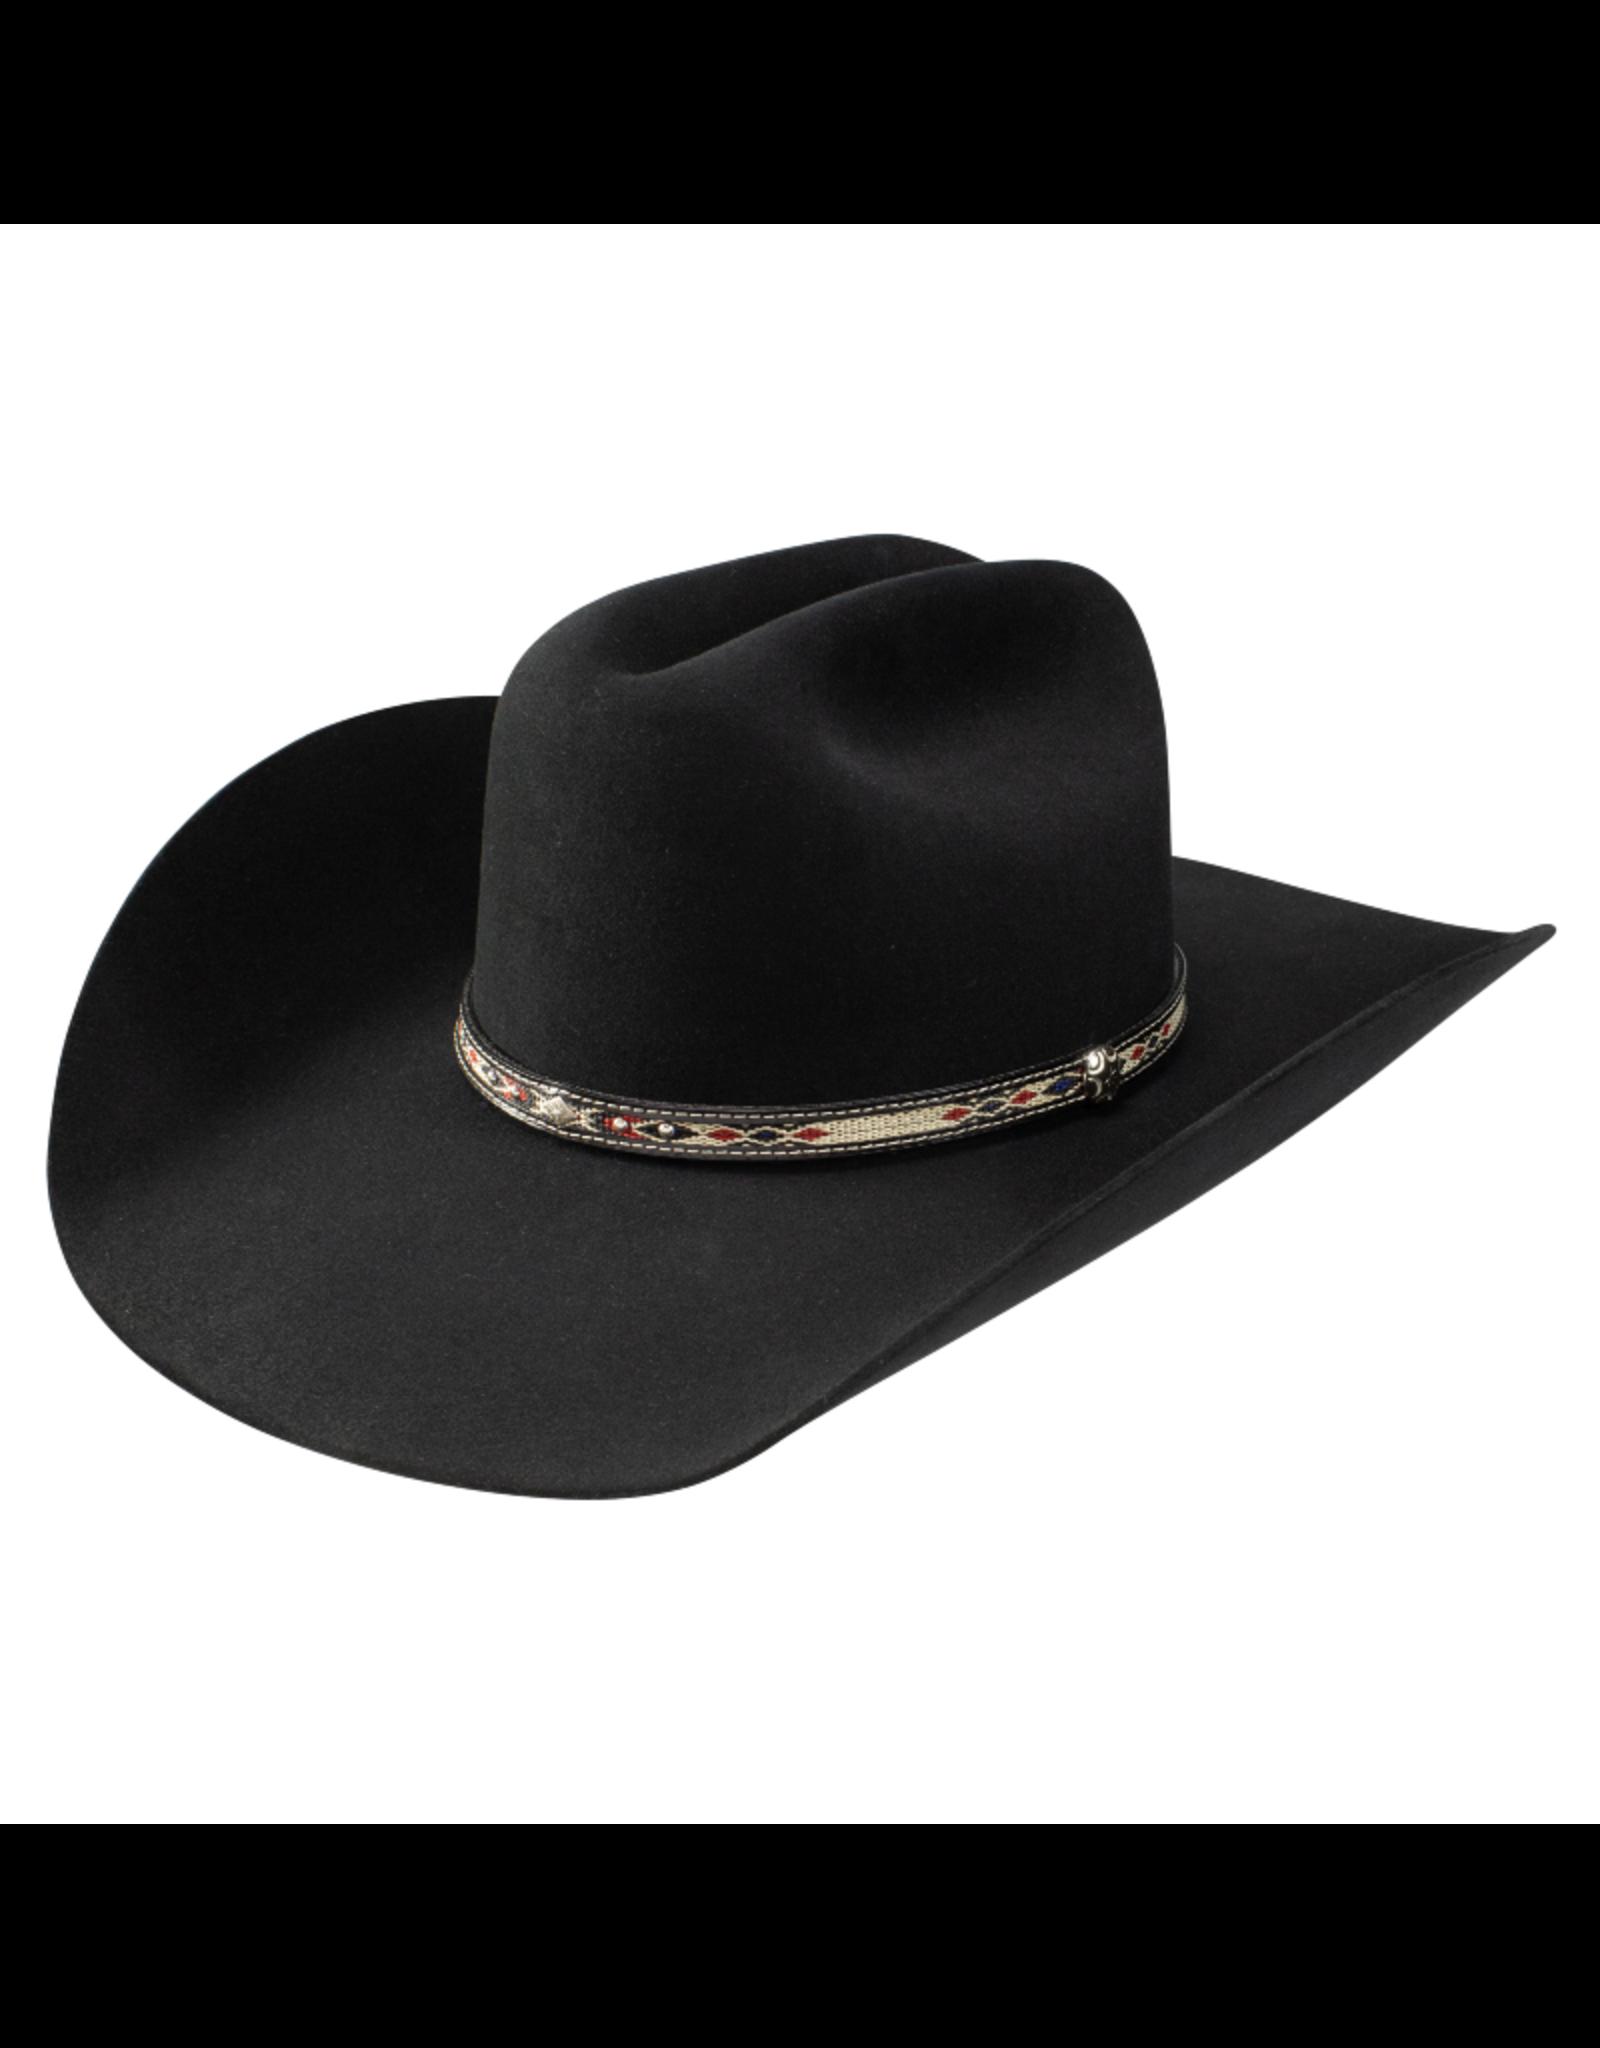 Stetson Hats Resistol Blackwood 6X Hat George Strait Collection